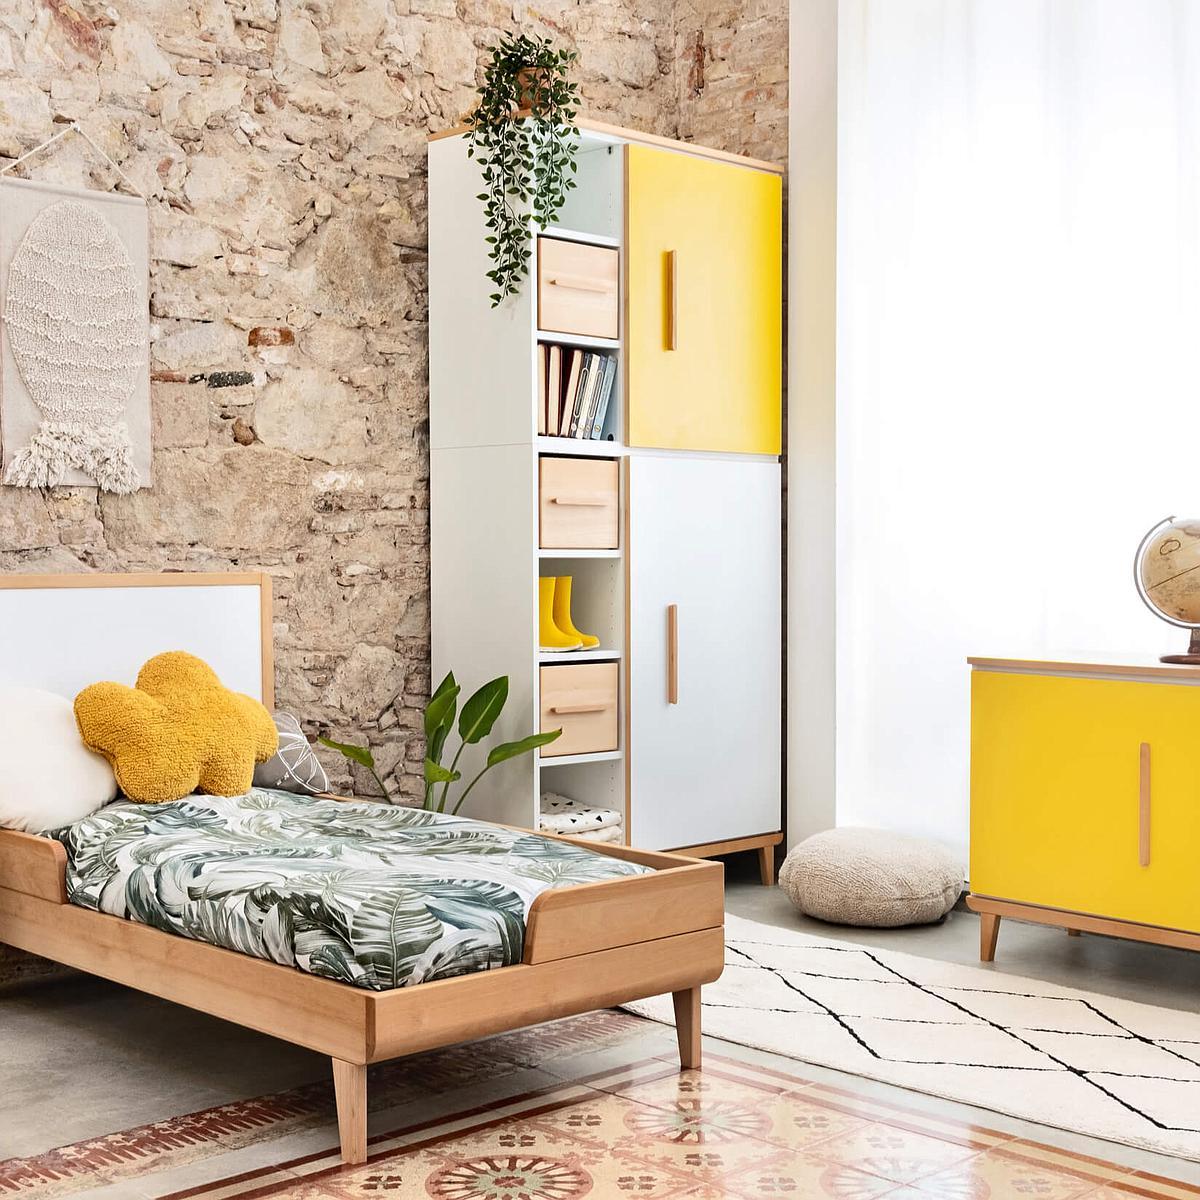 Armoire 198cm 2 portes NADO By A.K. sunshine yellow